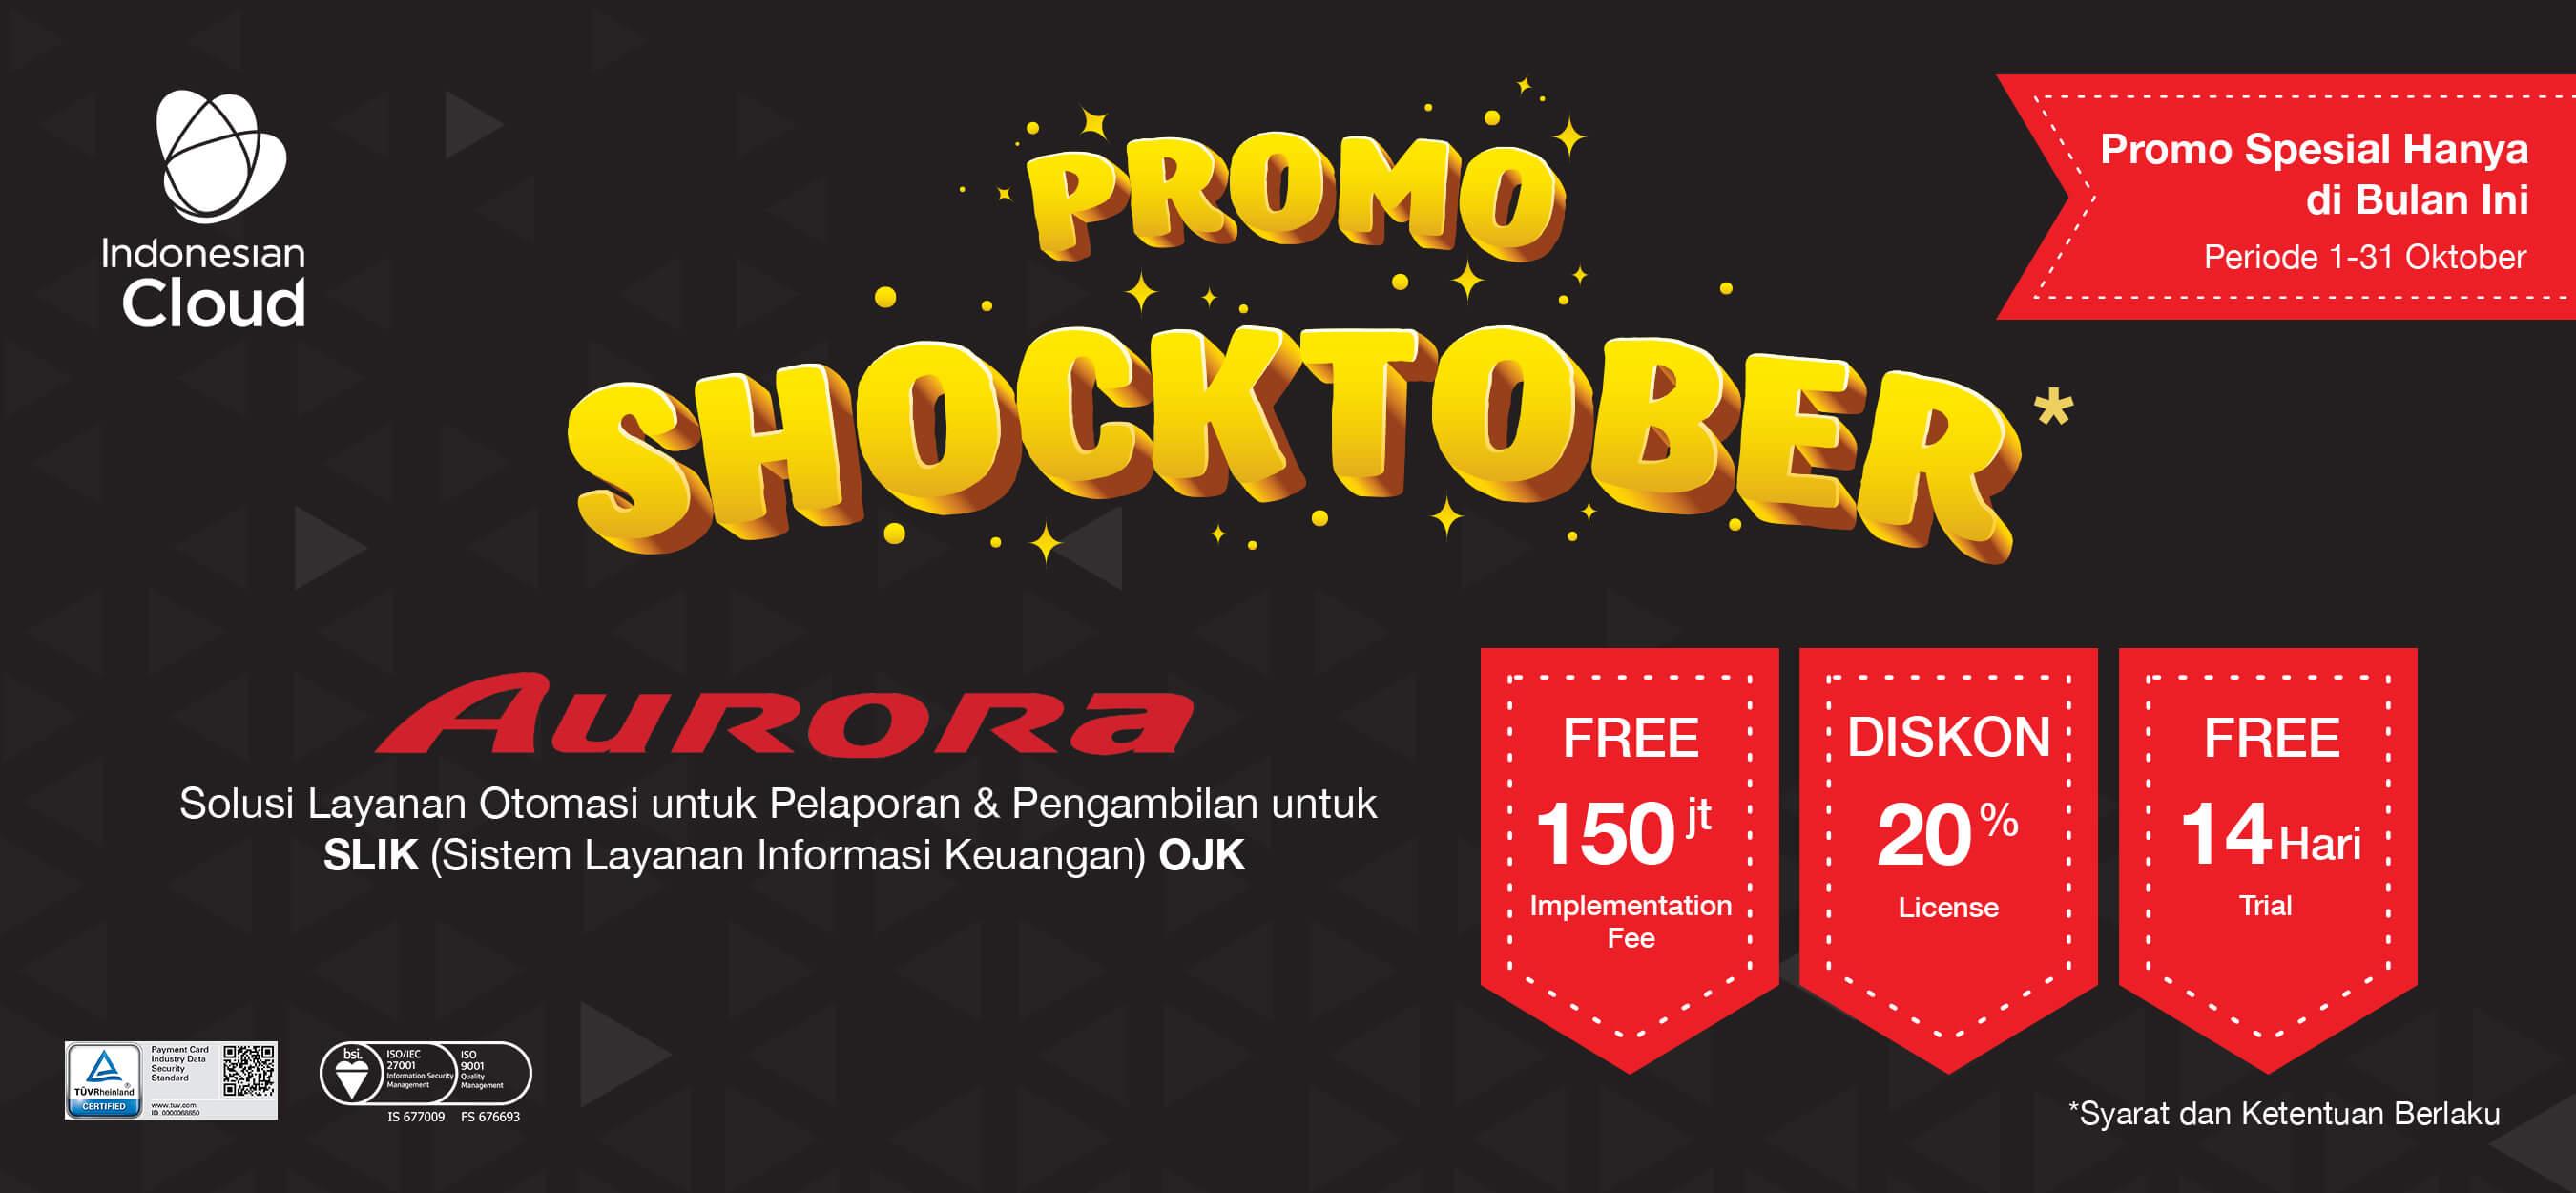 Promo AURORA SLIK Shocktober - Oktober 2019